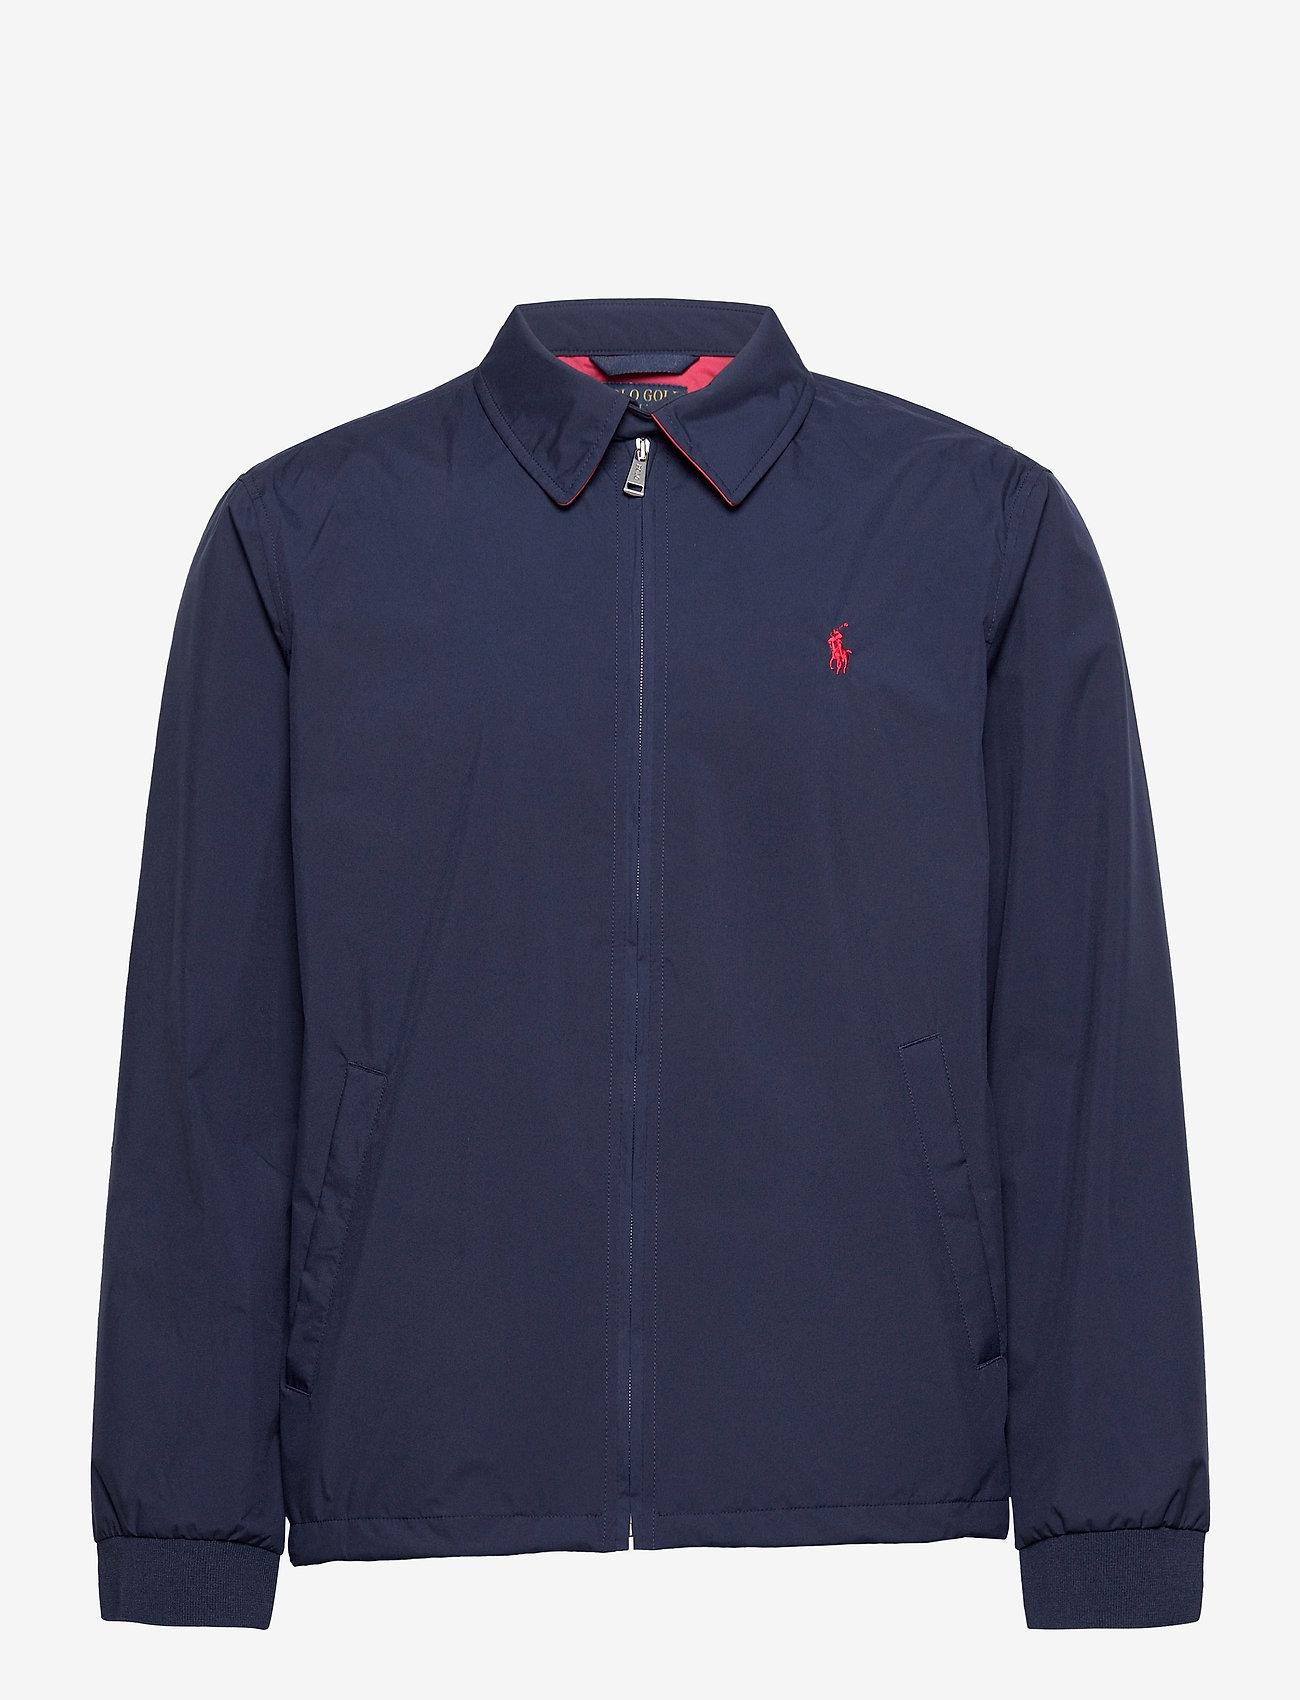 Ralph Lauren Golf - PERFRMNCE STRTCH 2L-BI-SWING JACKT - golf jackets - french navy - 0